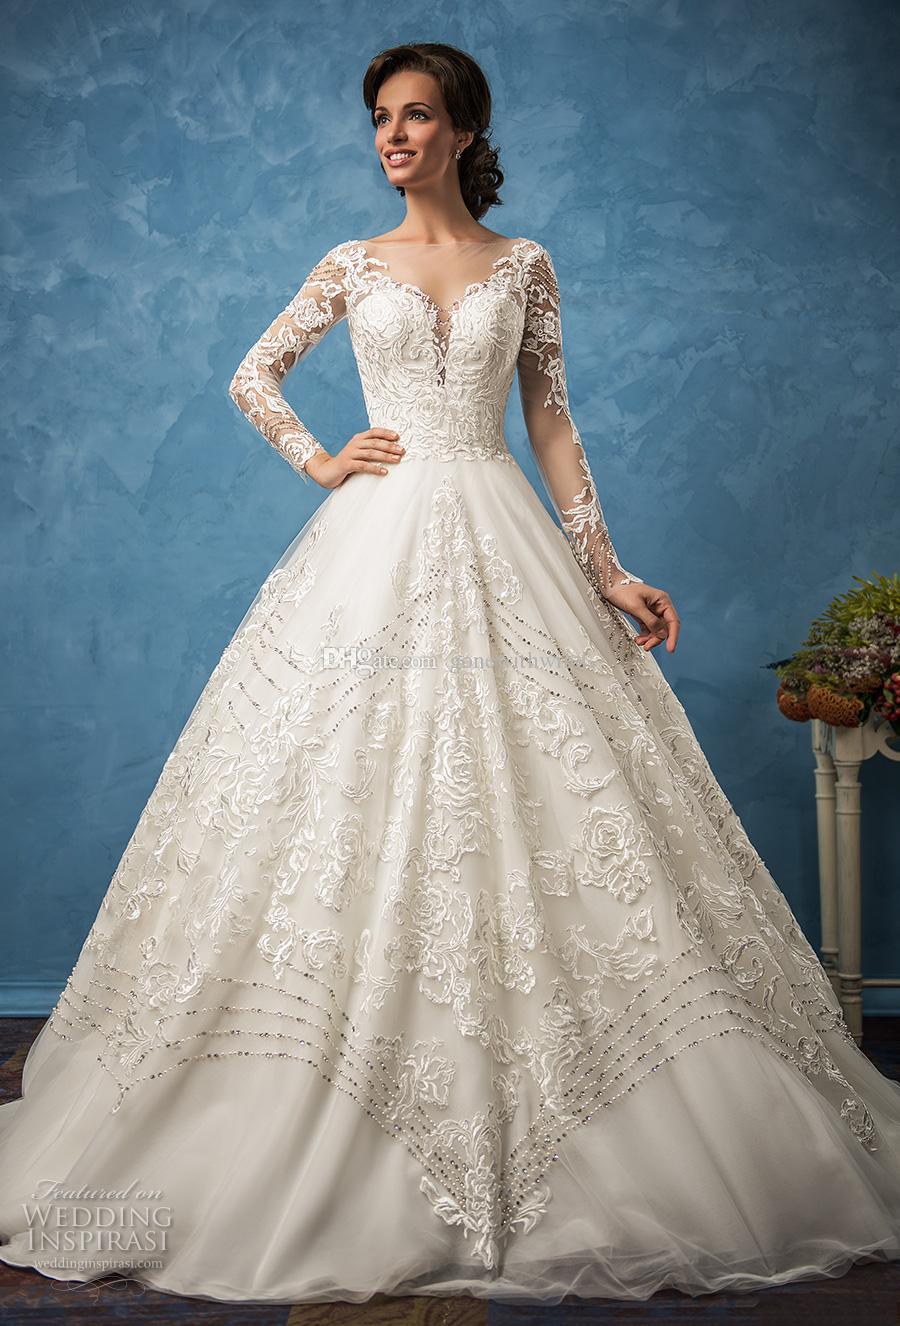 Fine Wedding Dress Discount Outlet Ornament - All Wedding Dresses ...